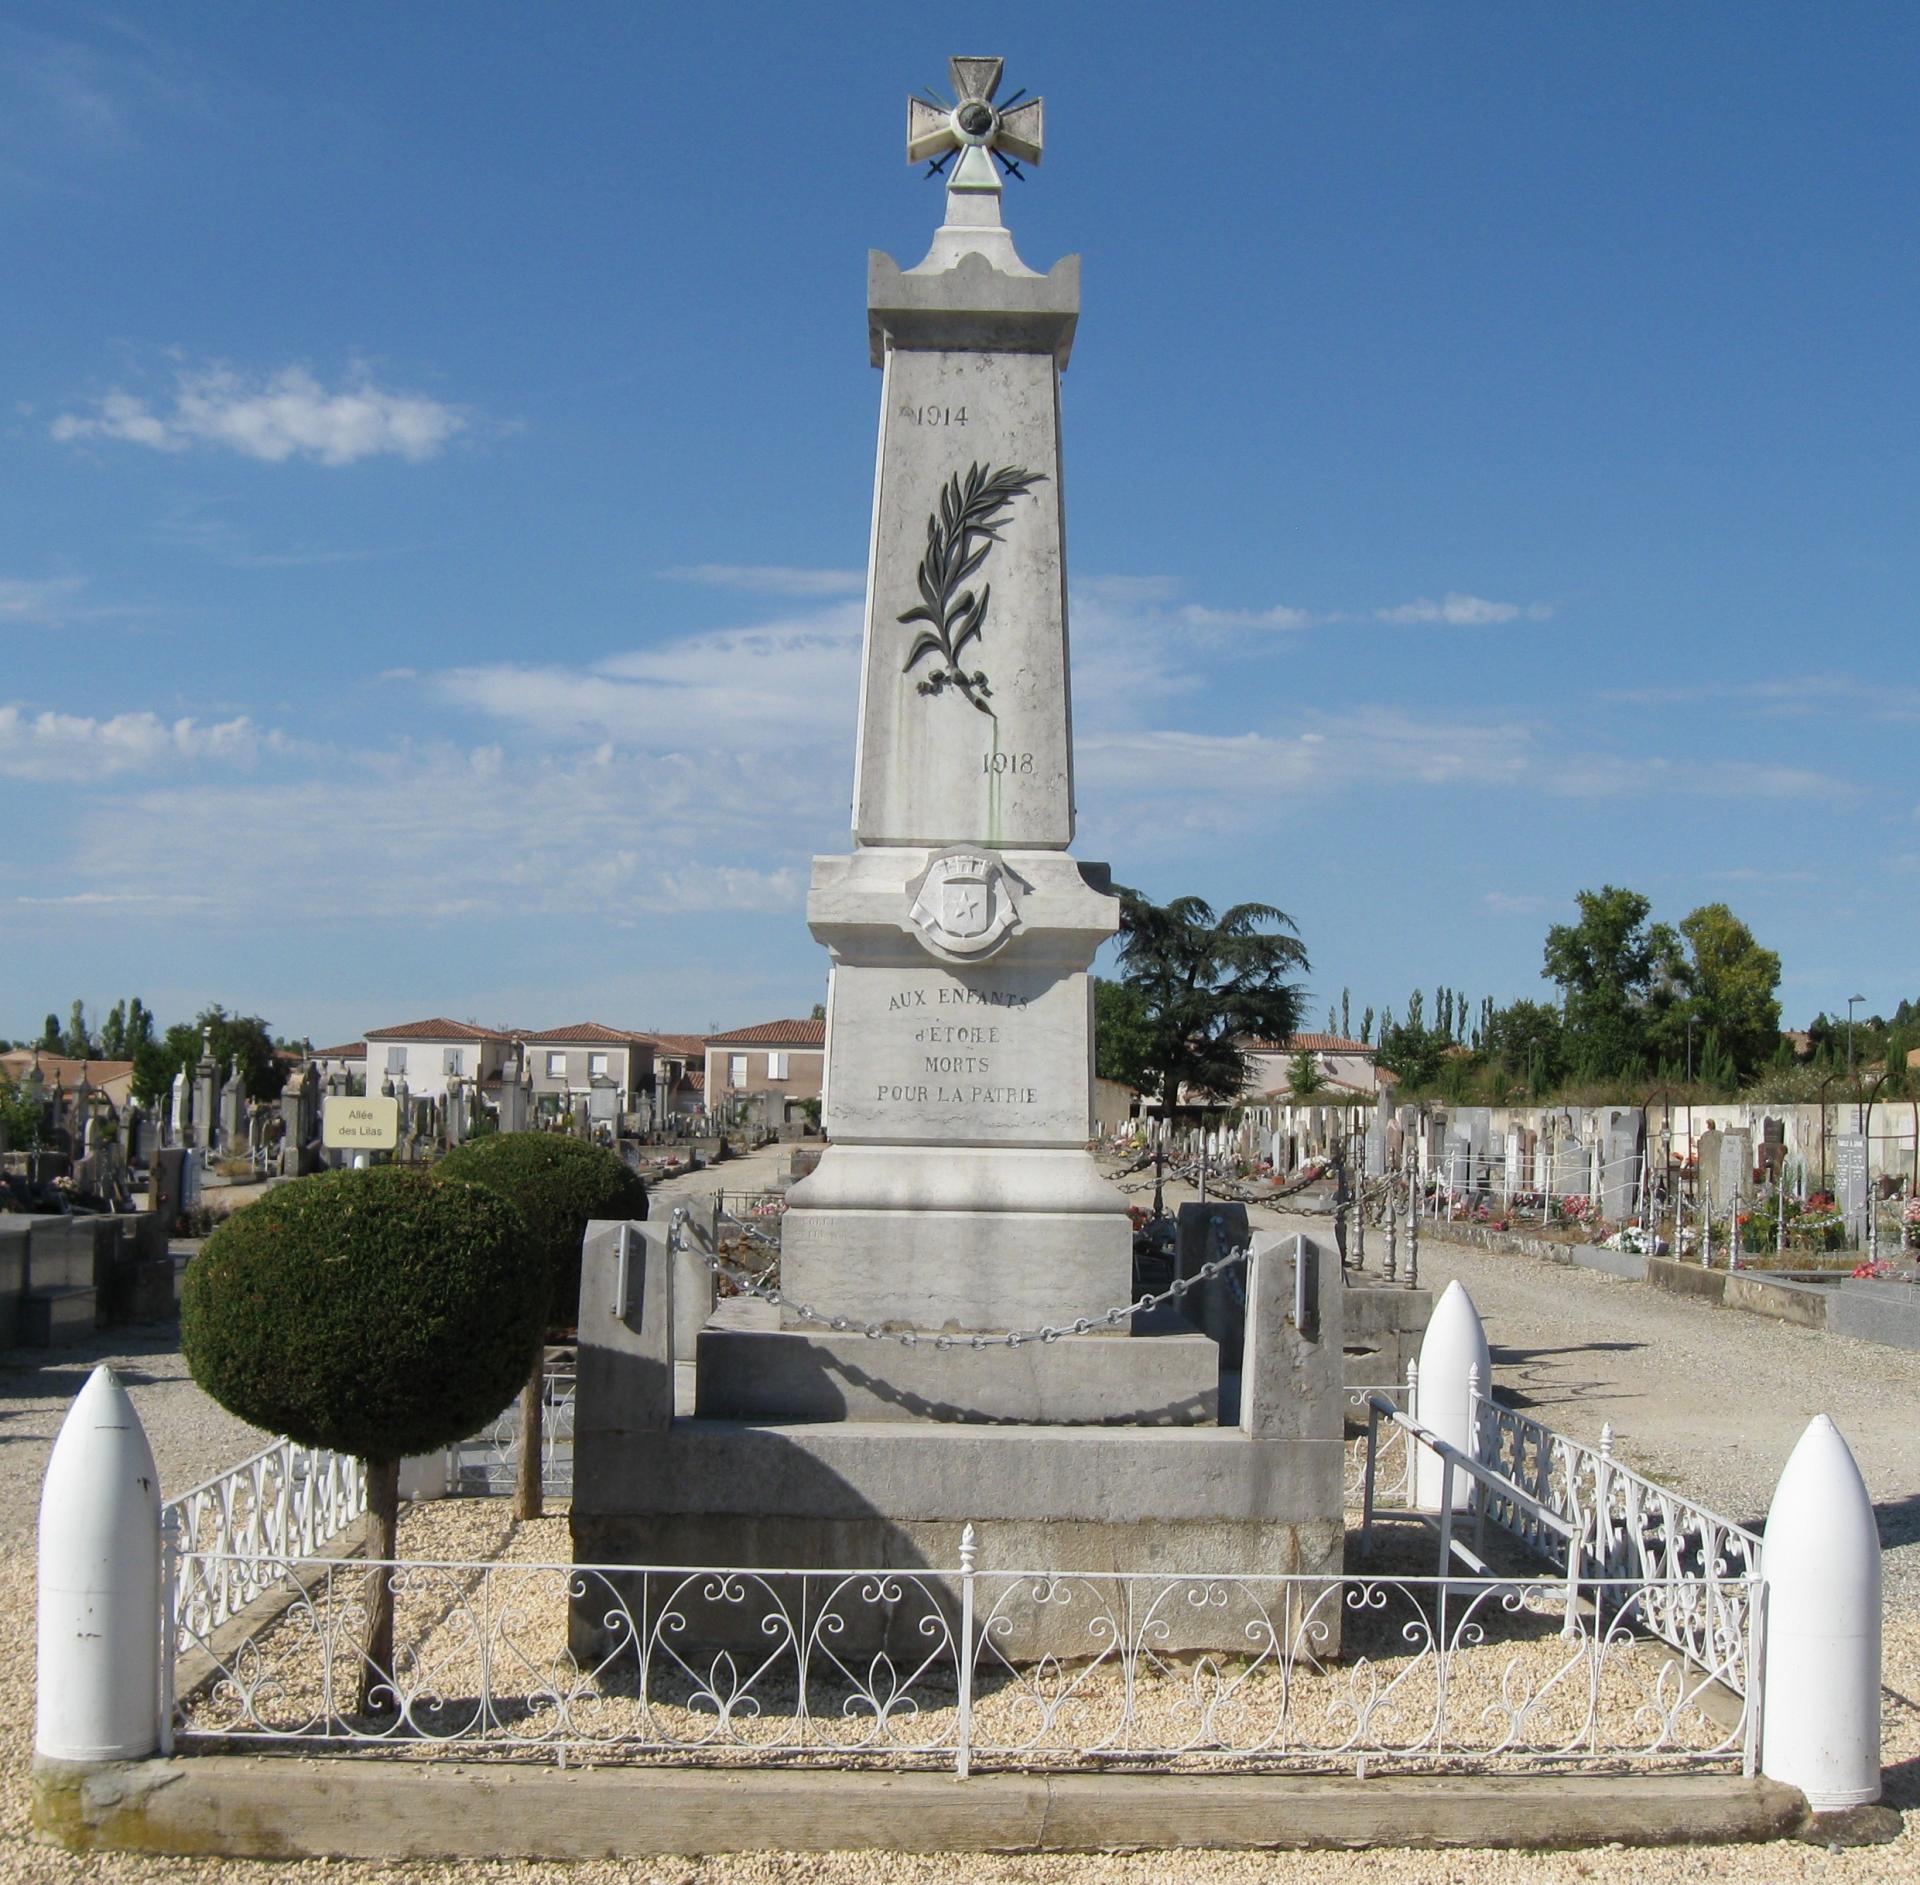 Etoile-sur-Rhône